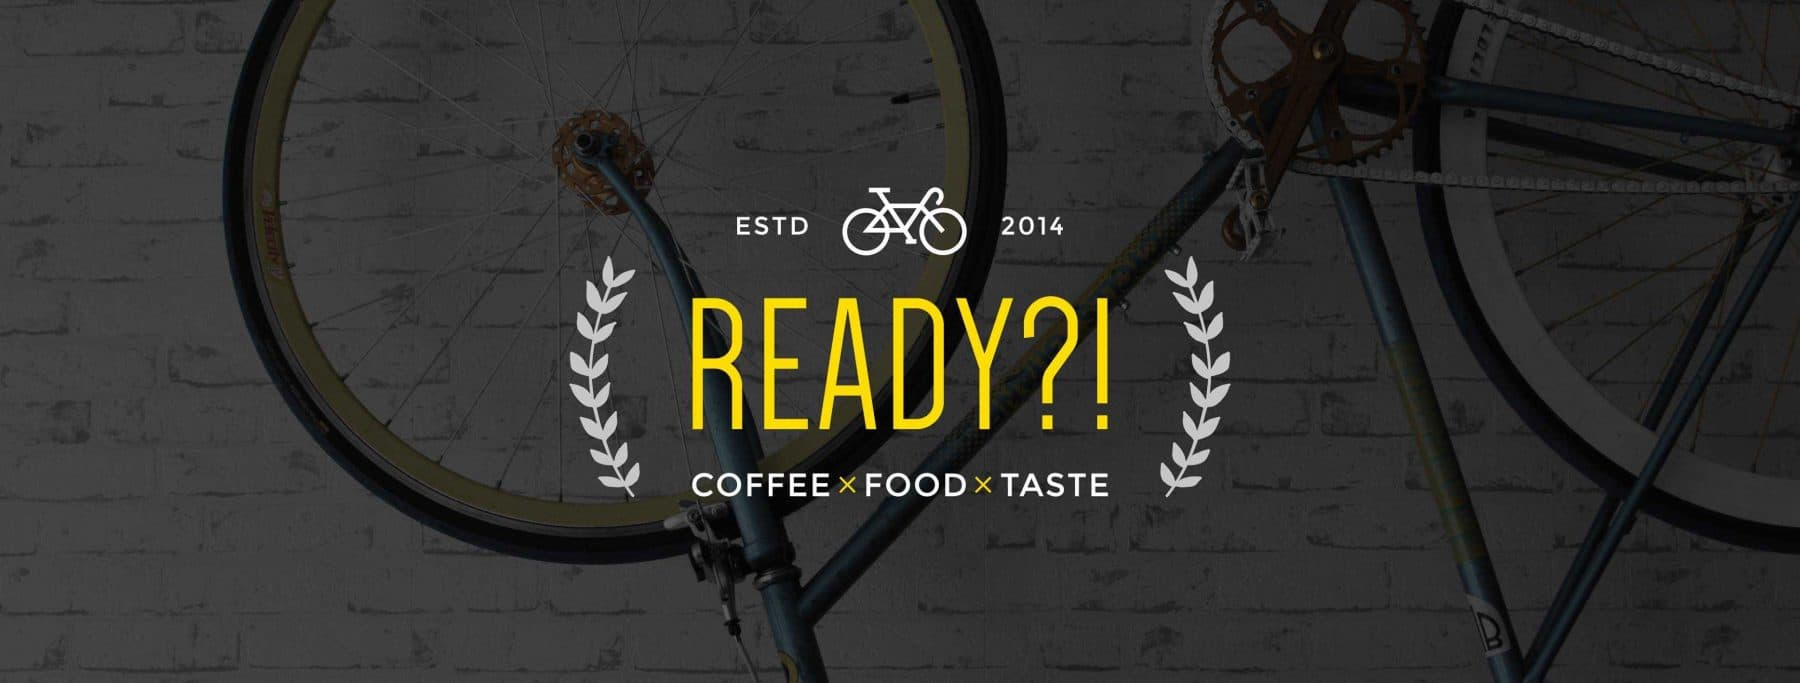 Ready-coffeeshop-Facebook-Cover